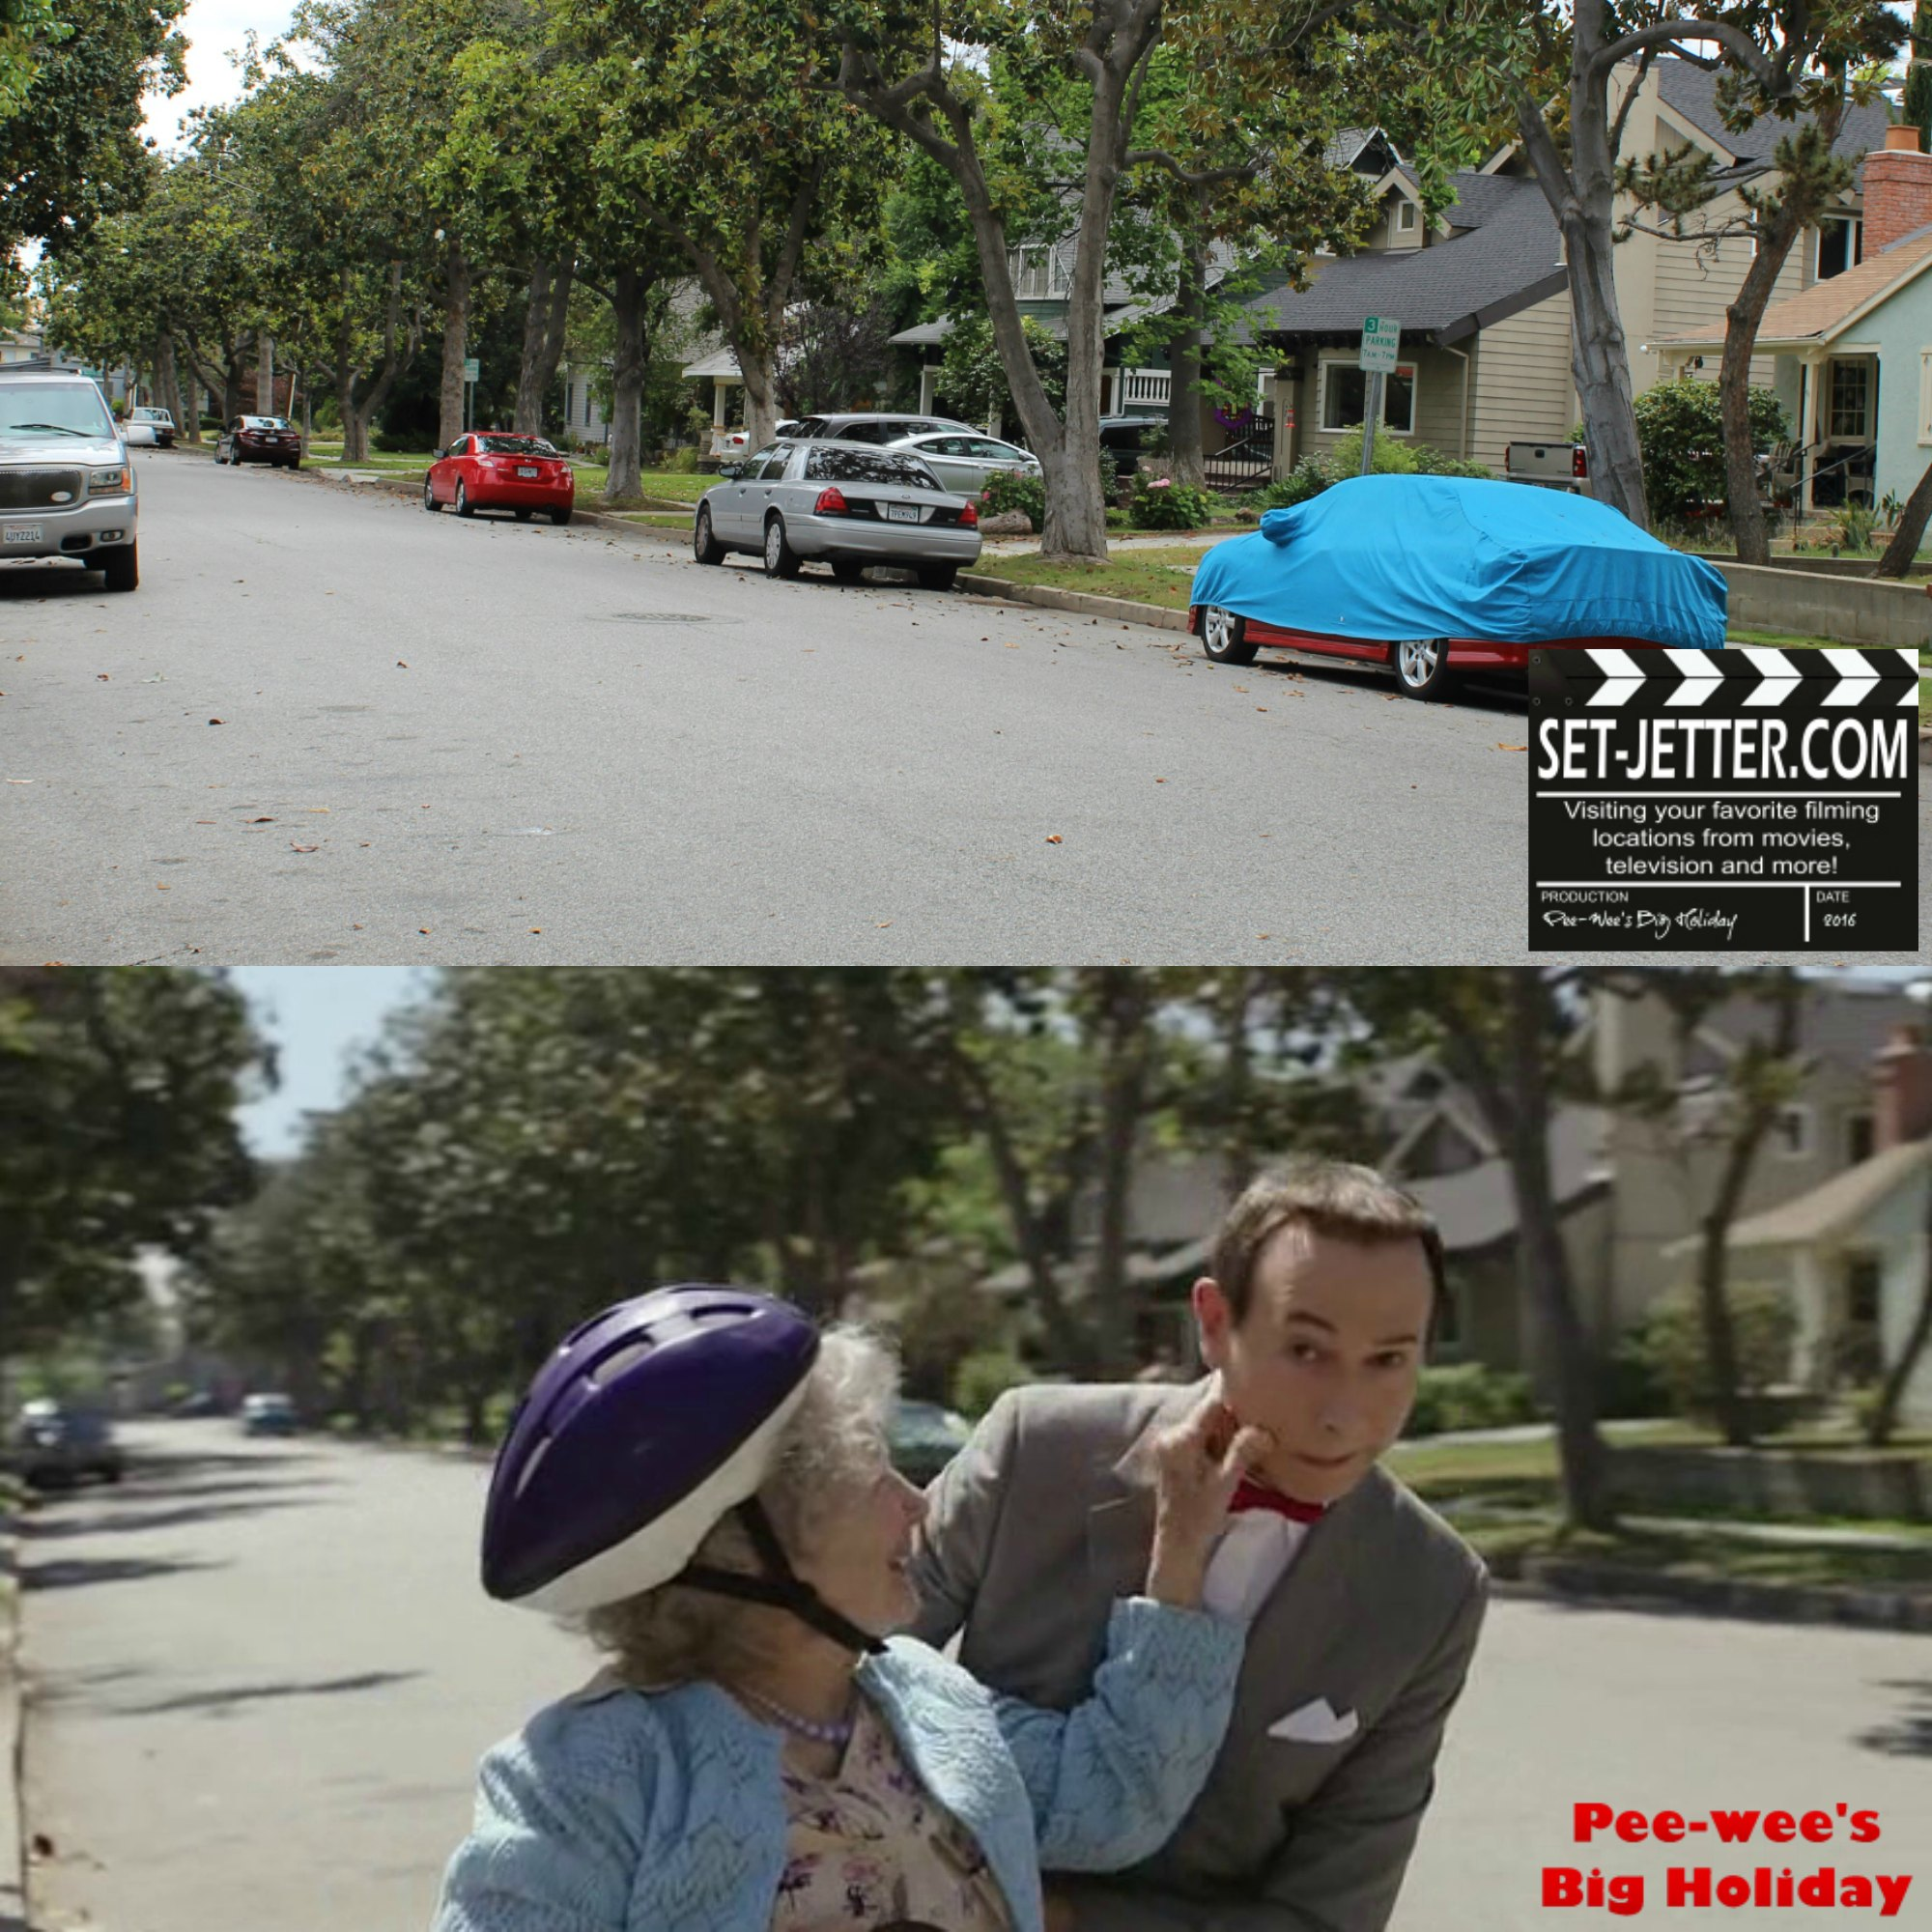 Pee Wee's Big Holiday comparison 228.jpg